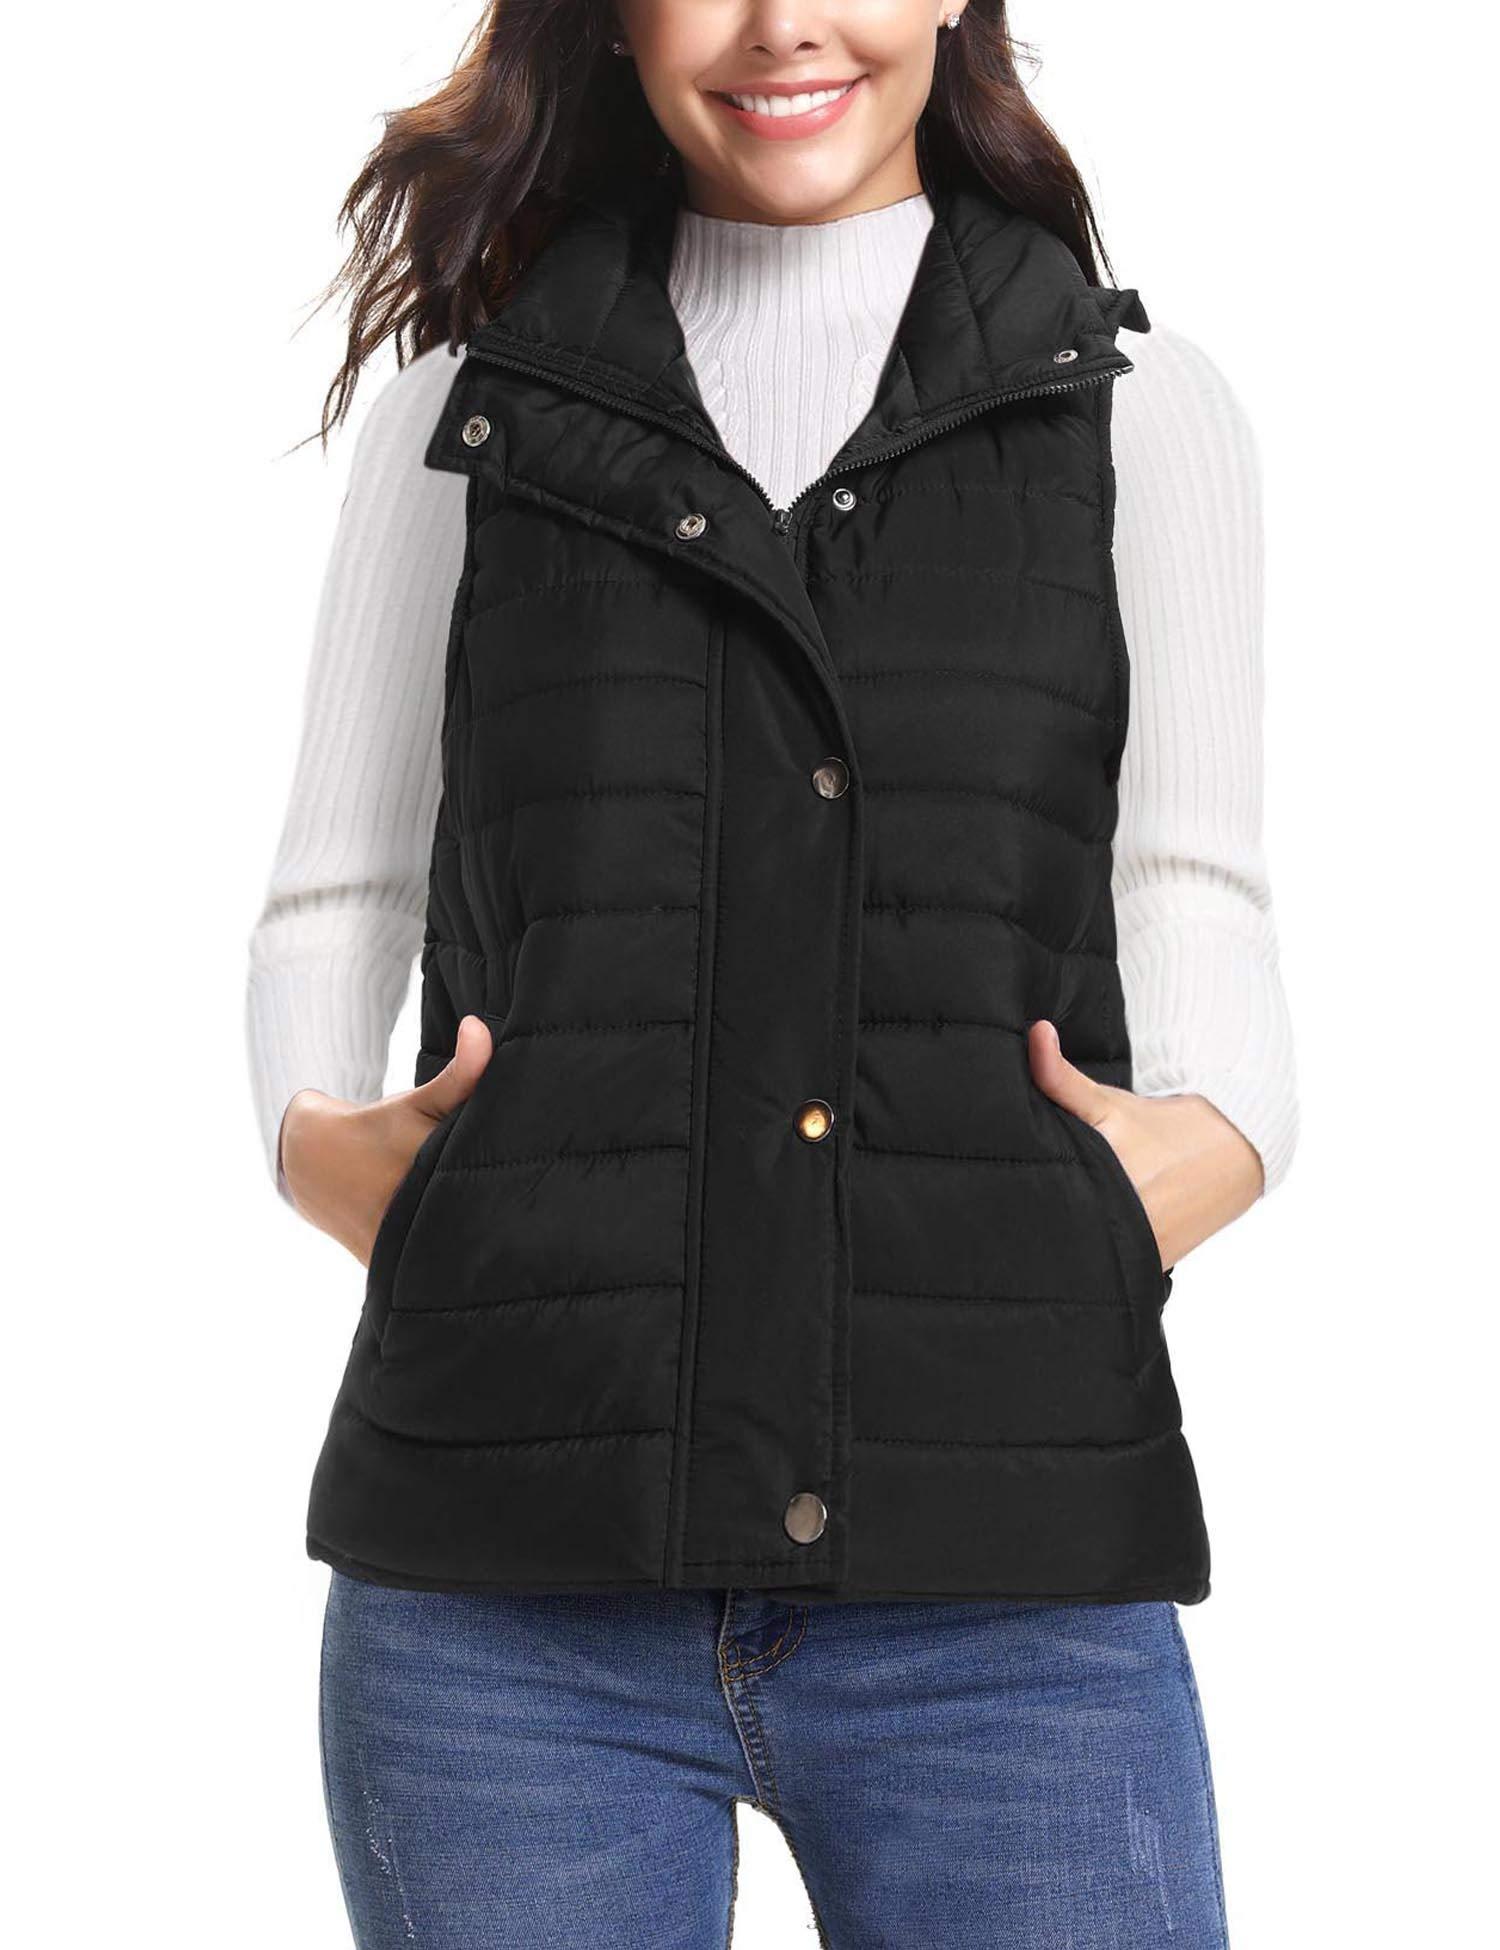 iClosam Women's Winter Puffer Vest Lightweight Packable Down Vest Quilted Jacket Coat